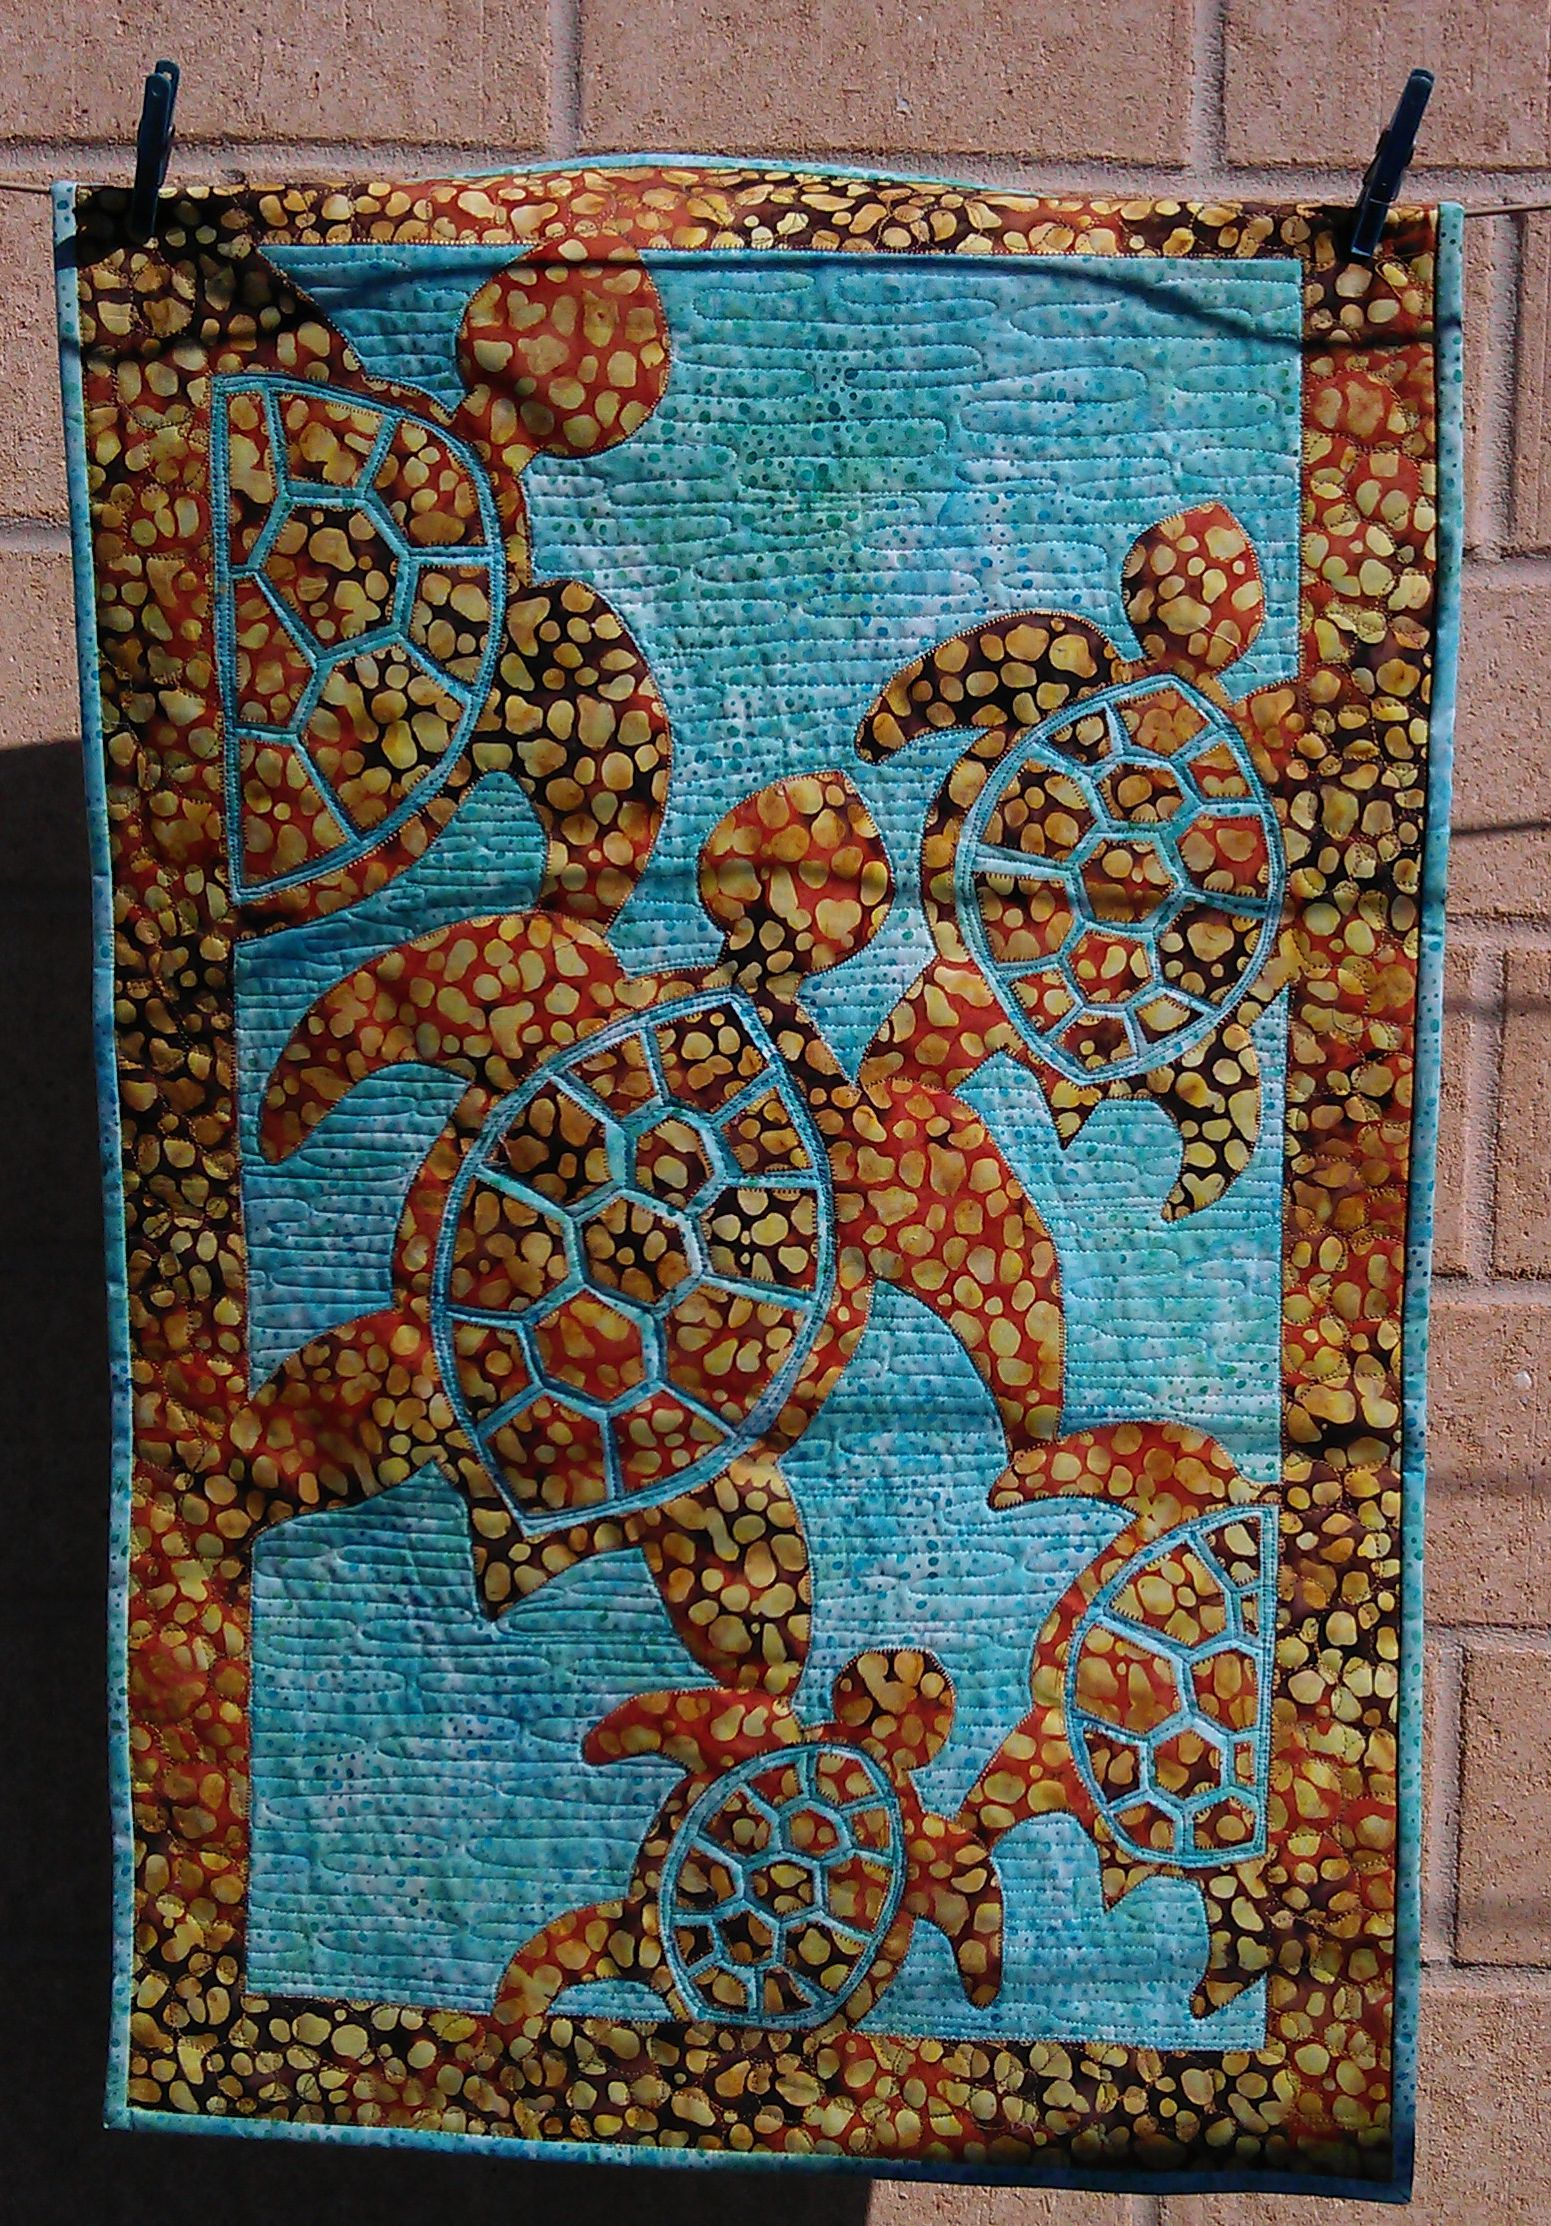 Quilt Patterns With Turtles : Turtle quilt Rhonda Bracey: At Random